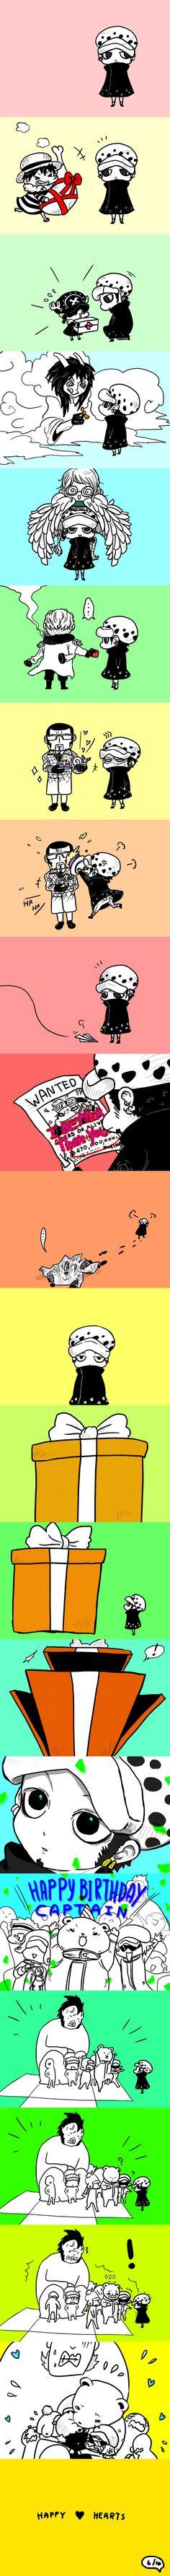 Tags: Anime, Fanart, ONE PIECE, Monkey D. Luffy, Tony Tony Chopper